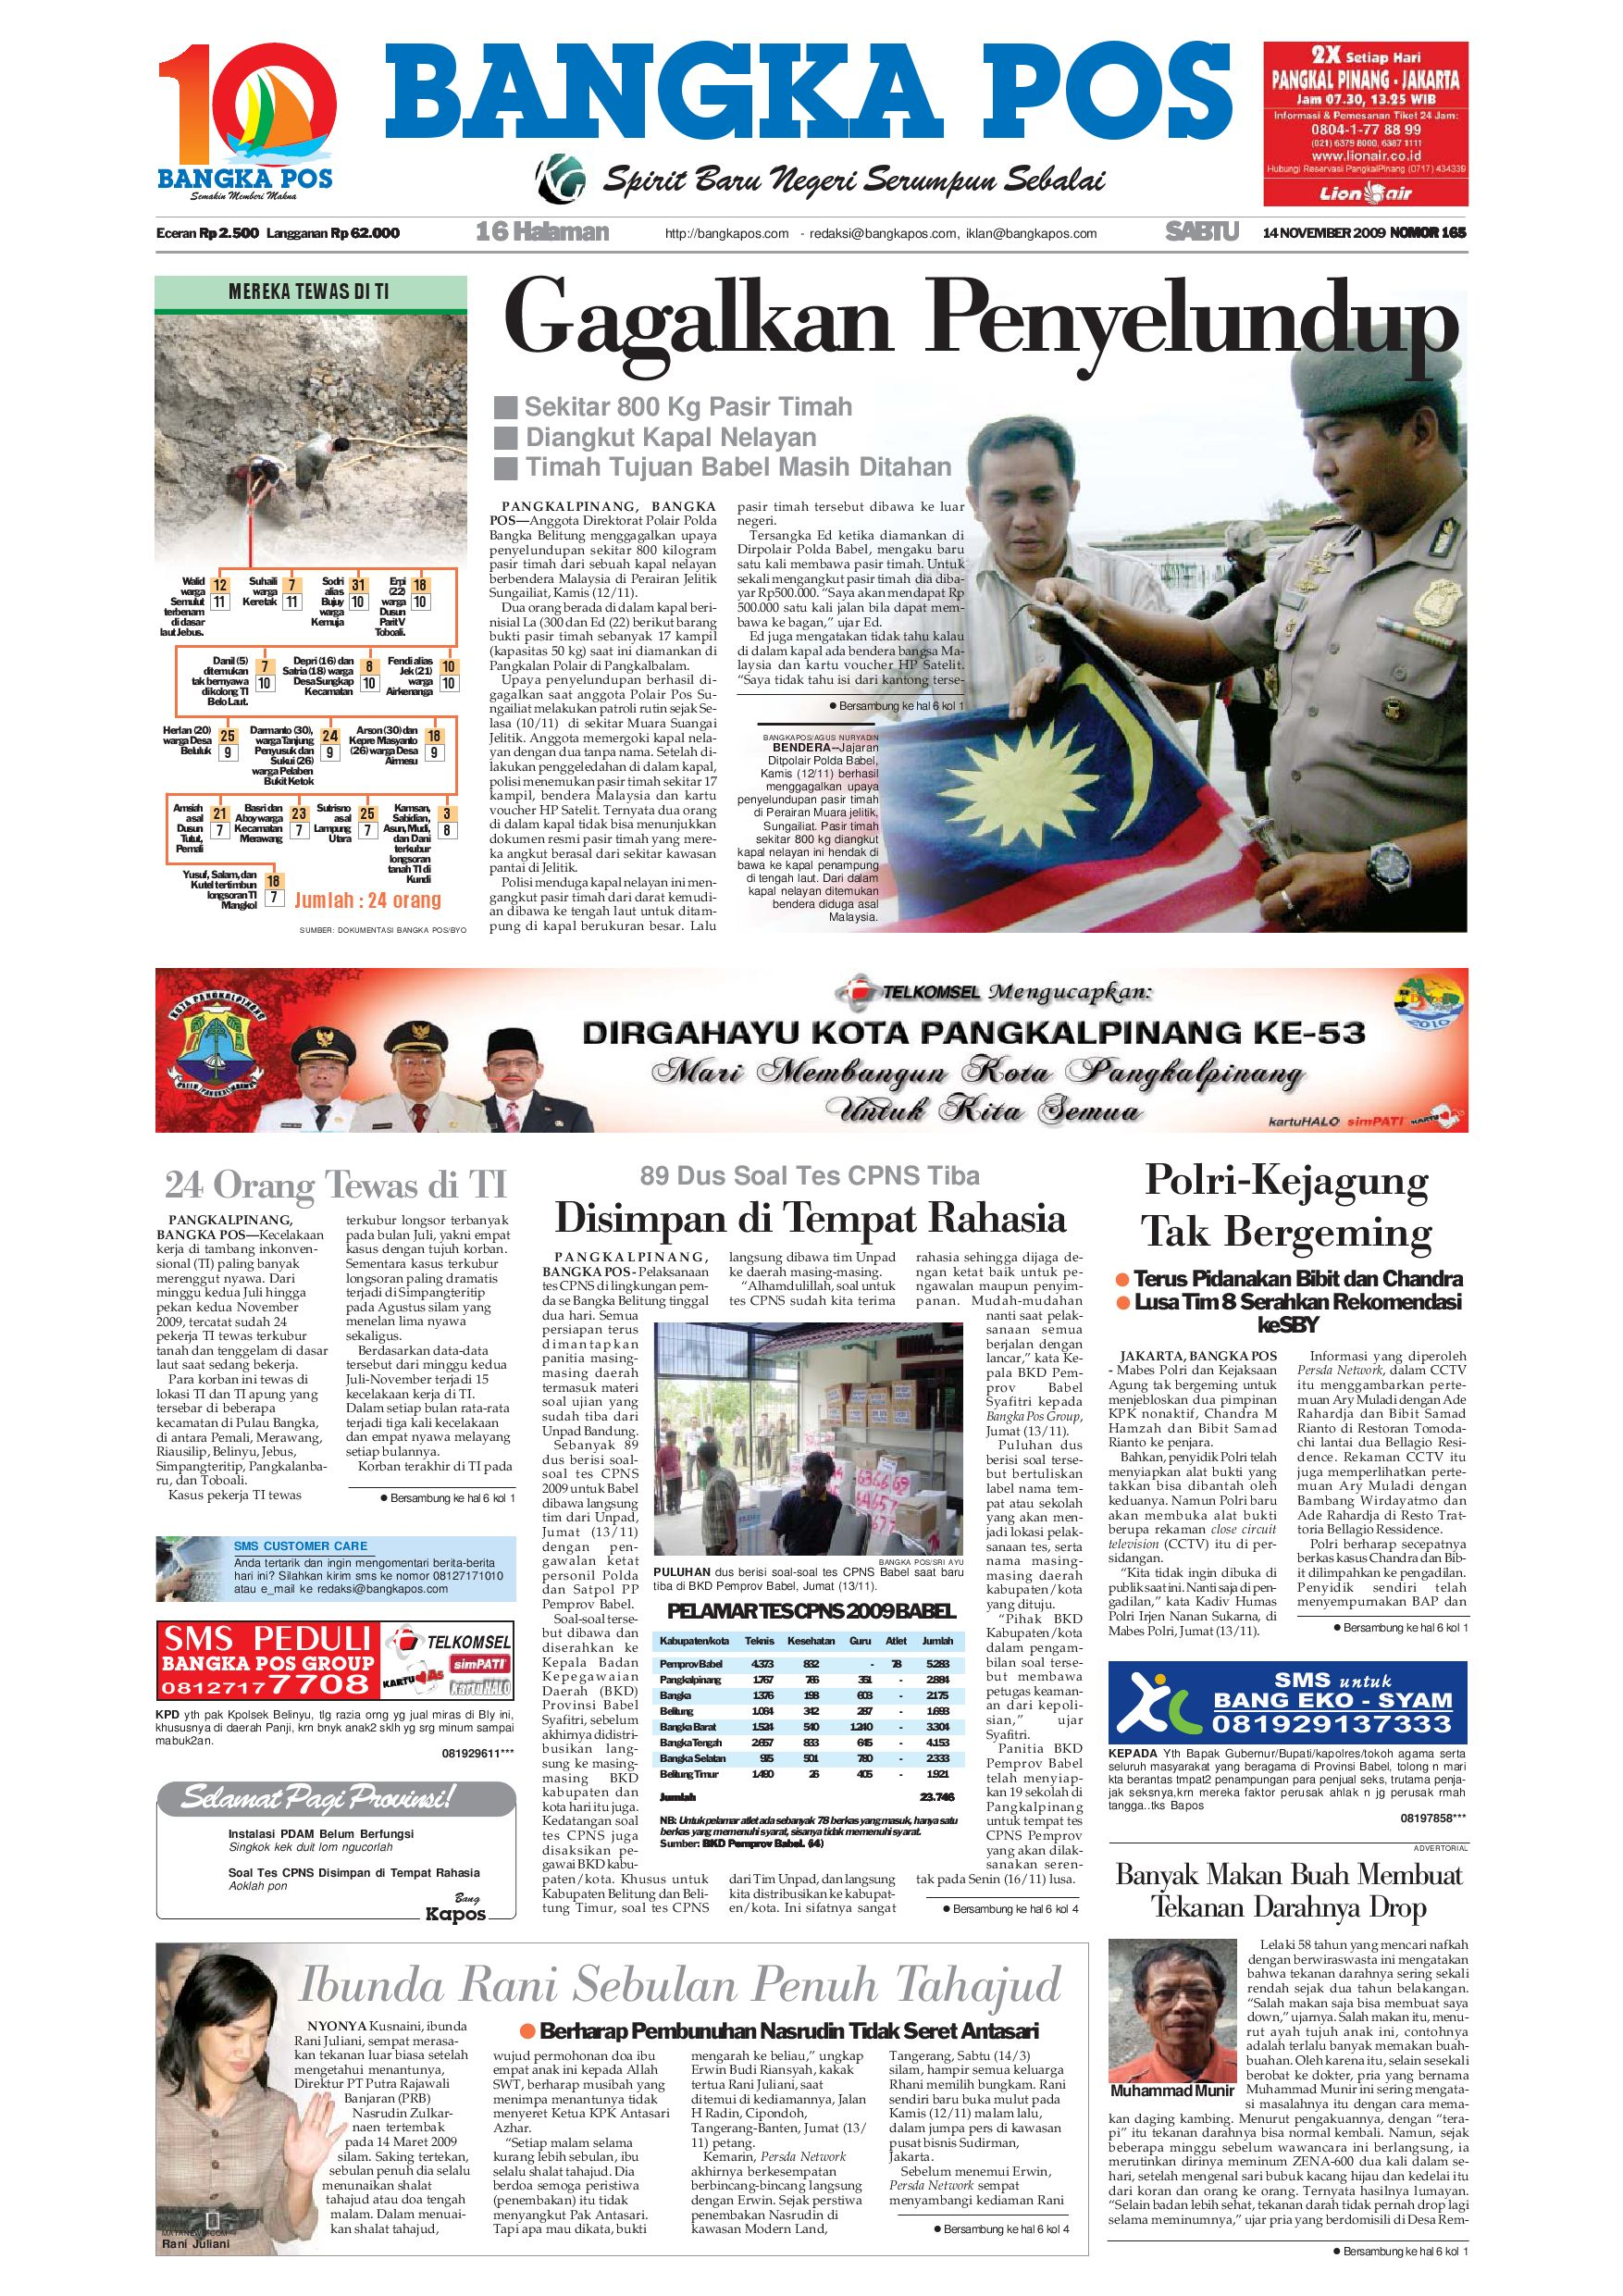 Harian Pagi Bangka Pos Edisi 14 November 2009 By Issuu Parcel Makanan Ampamp Keramik Pja 1608